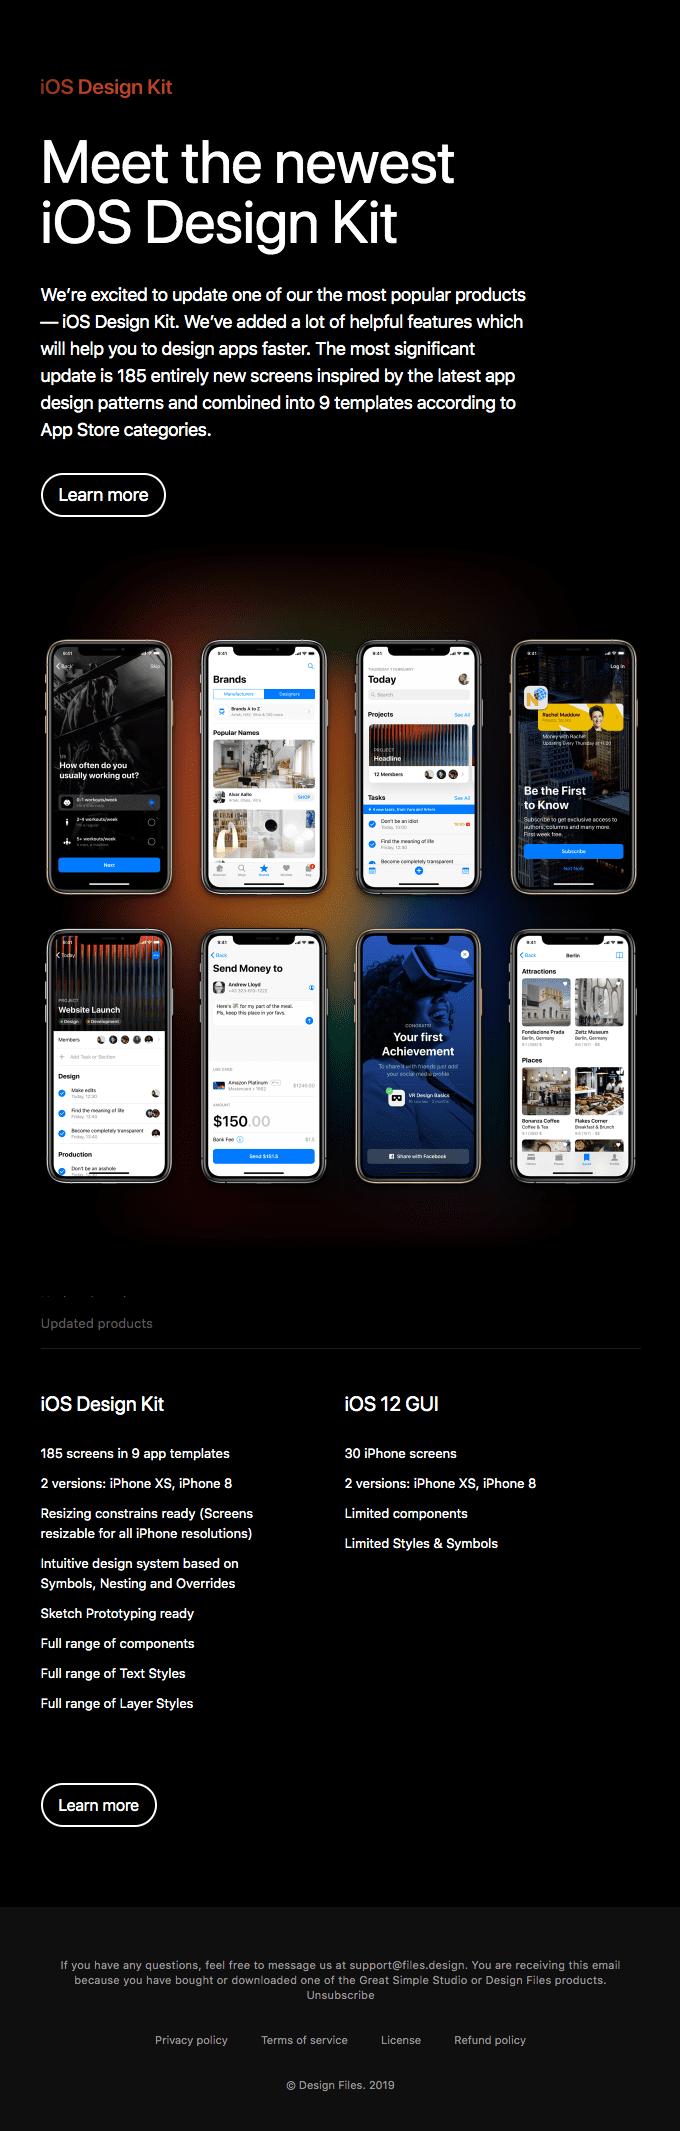 Meet the new iOS Design Kit